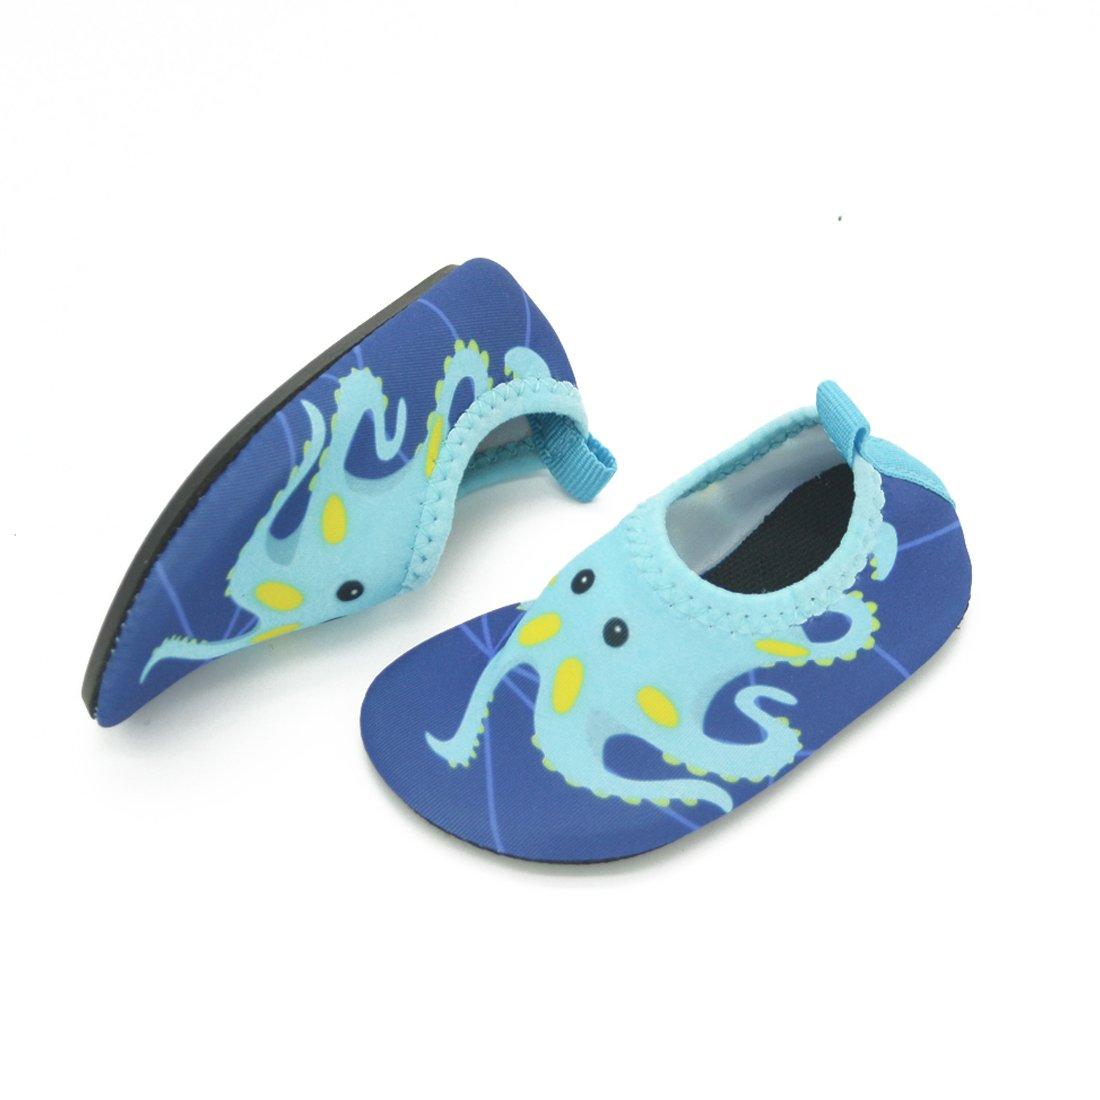 Lauwodun Baby Boys Girls Water Shoes Barefoot Aqua Sock Shoes for Beach Pool Surfing Yoga Swimming Walking-Green Octopus1819 by Lauwodun (Image #6)